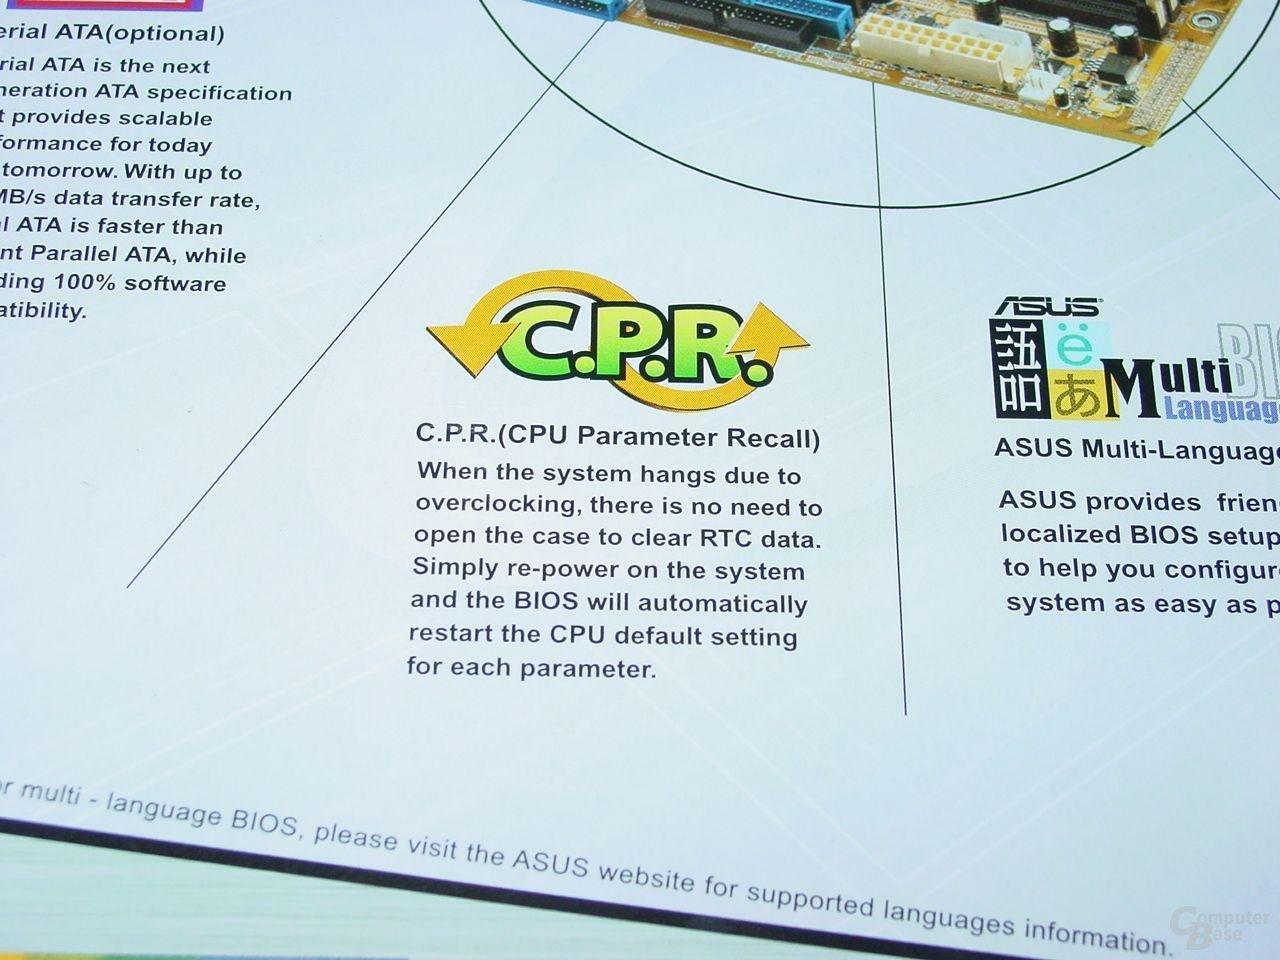 CPU Parameter Recall